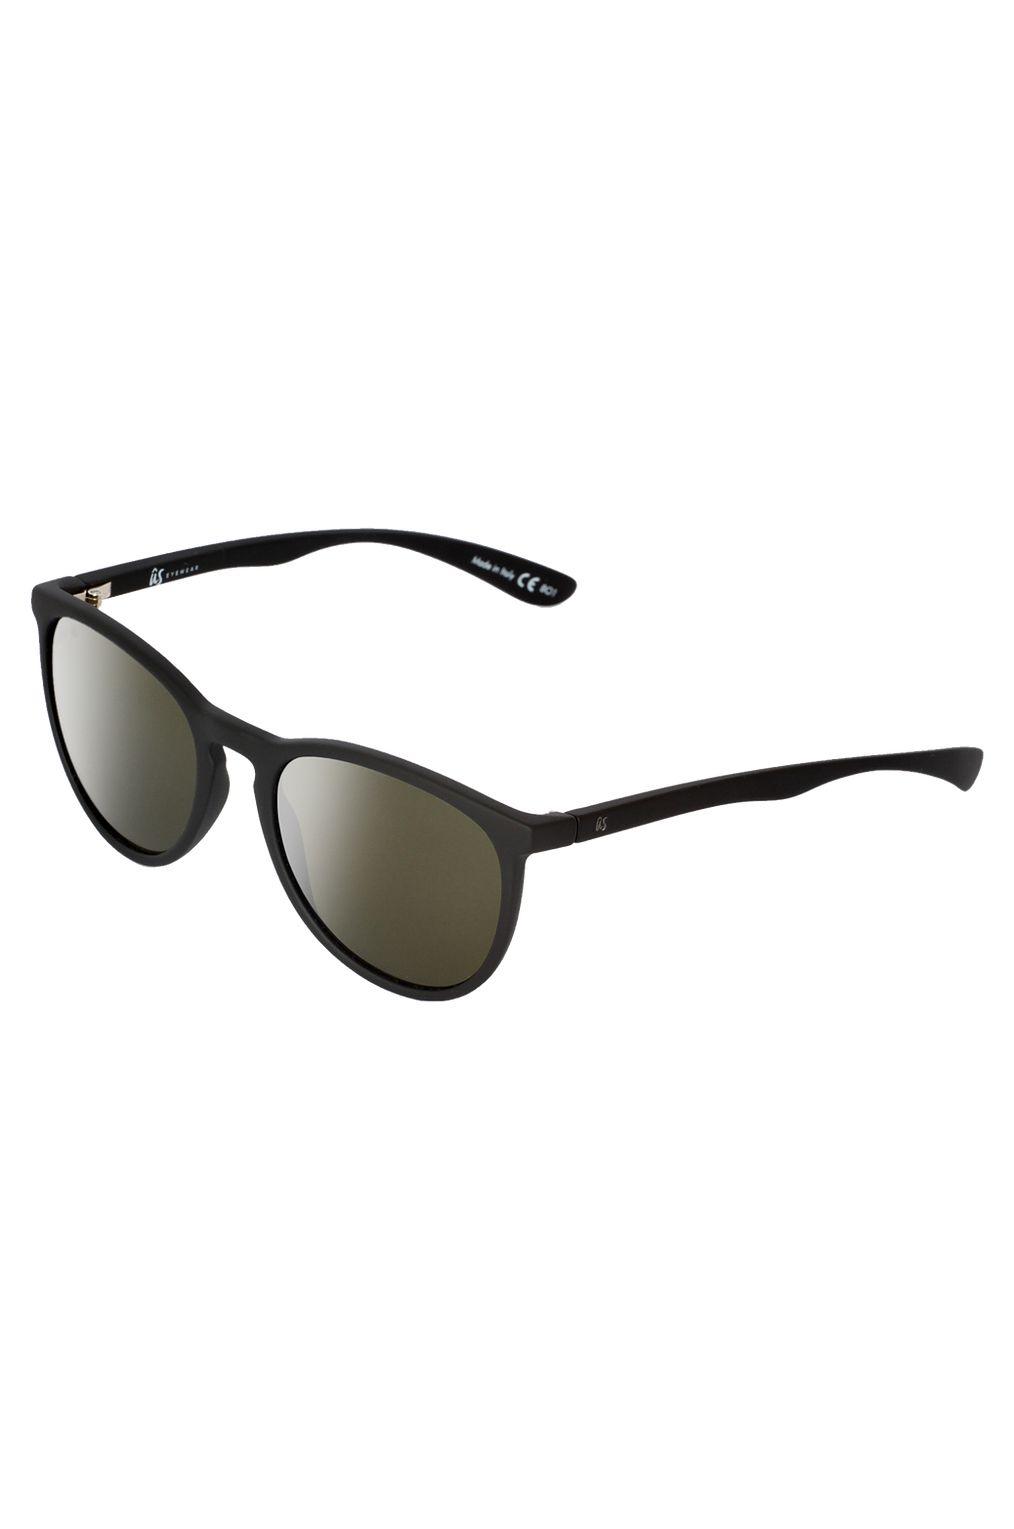 Oculos US NOBIS Matte Black/Vintage Grey Polarized